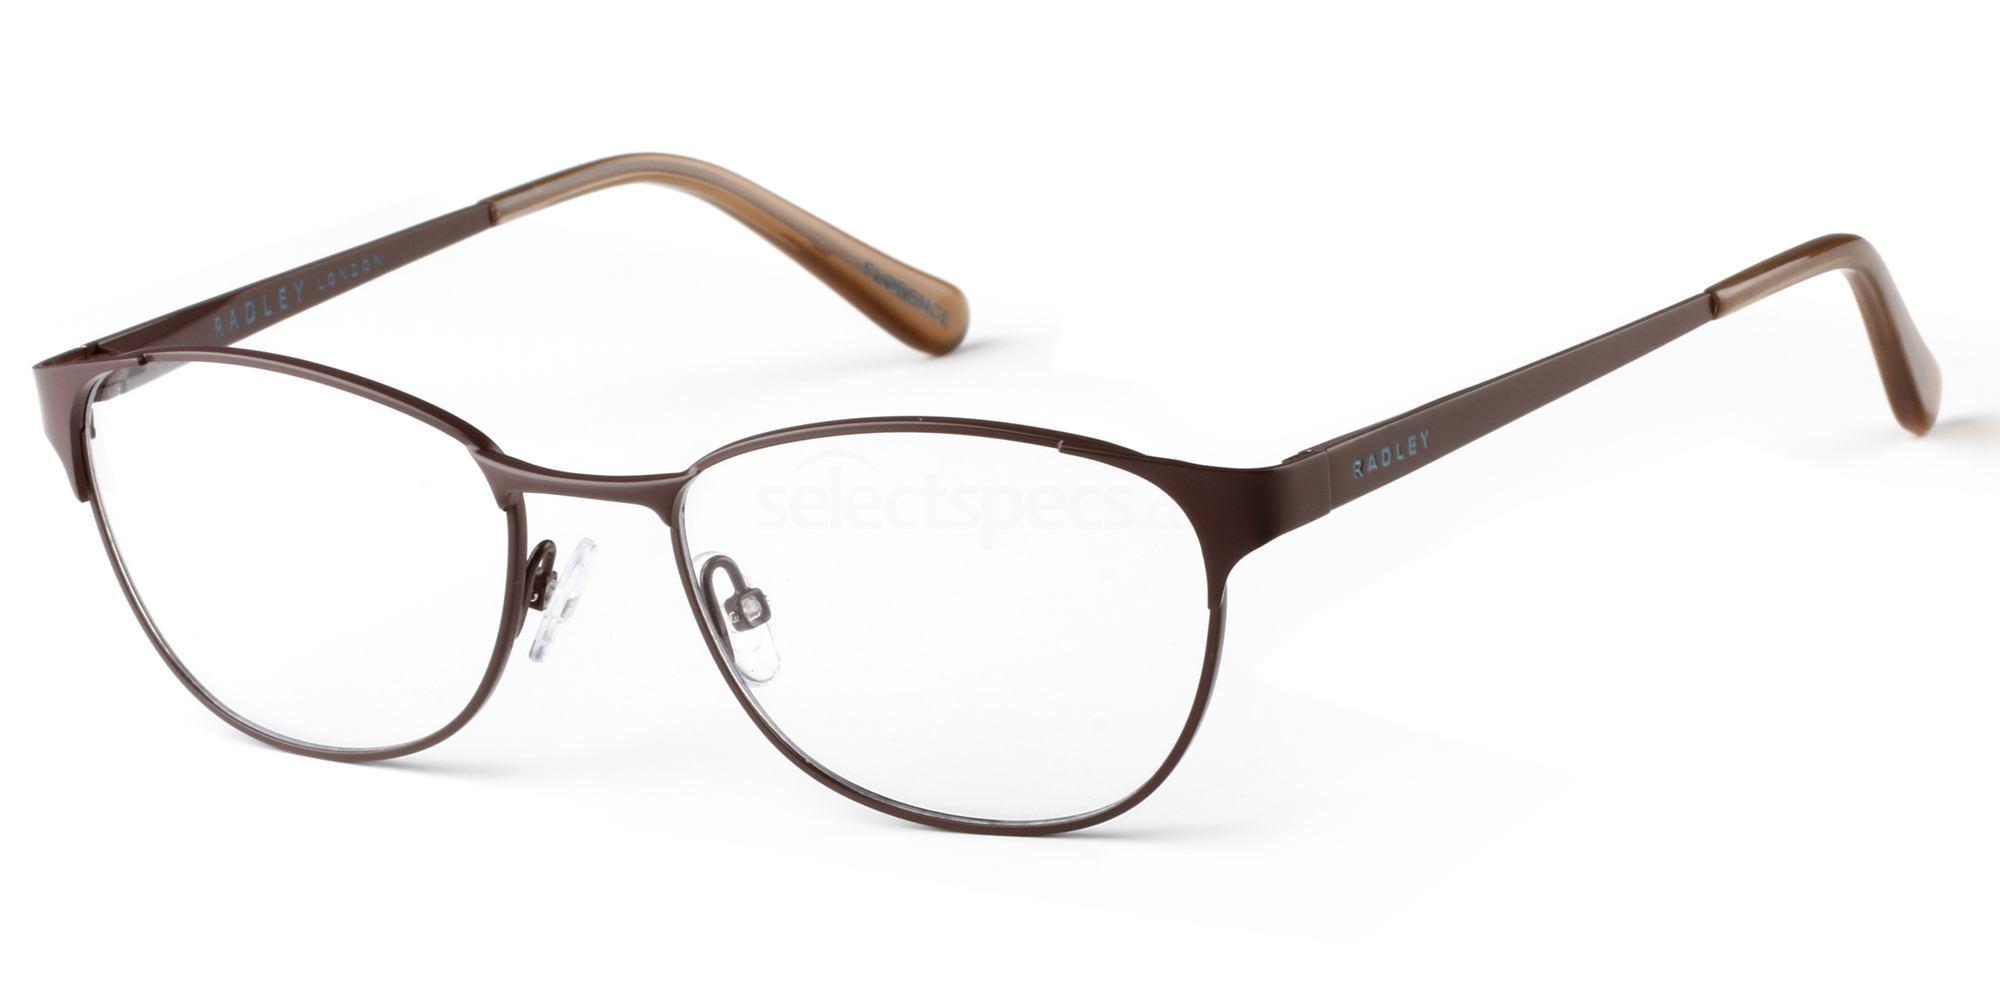 003 RDO-FLORENCE Glasses, Radley London